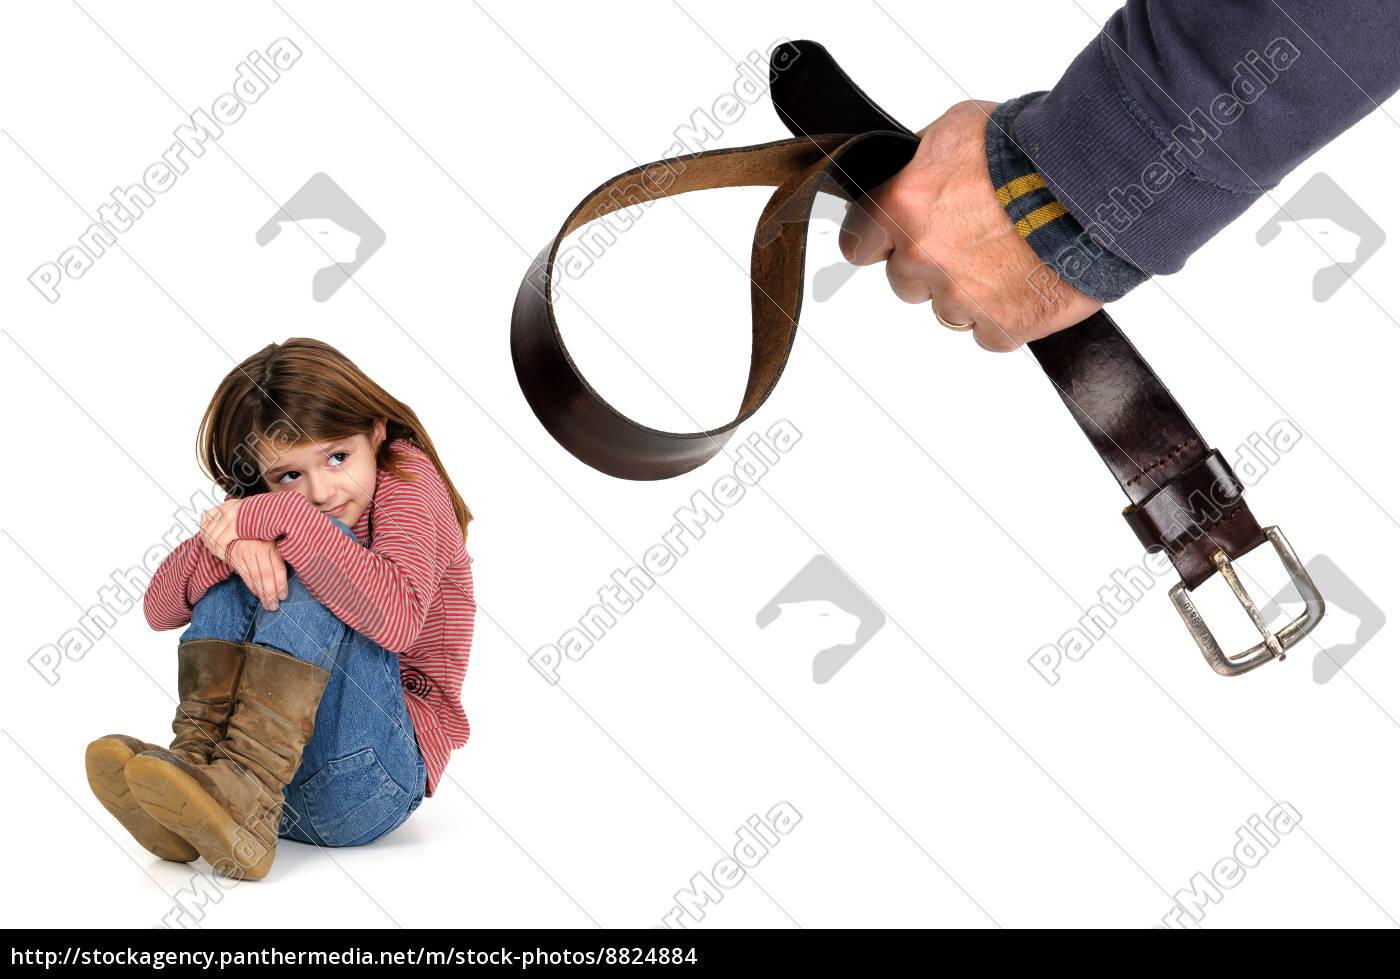 kindesmissbrauch - 8824884